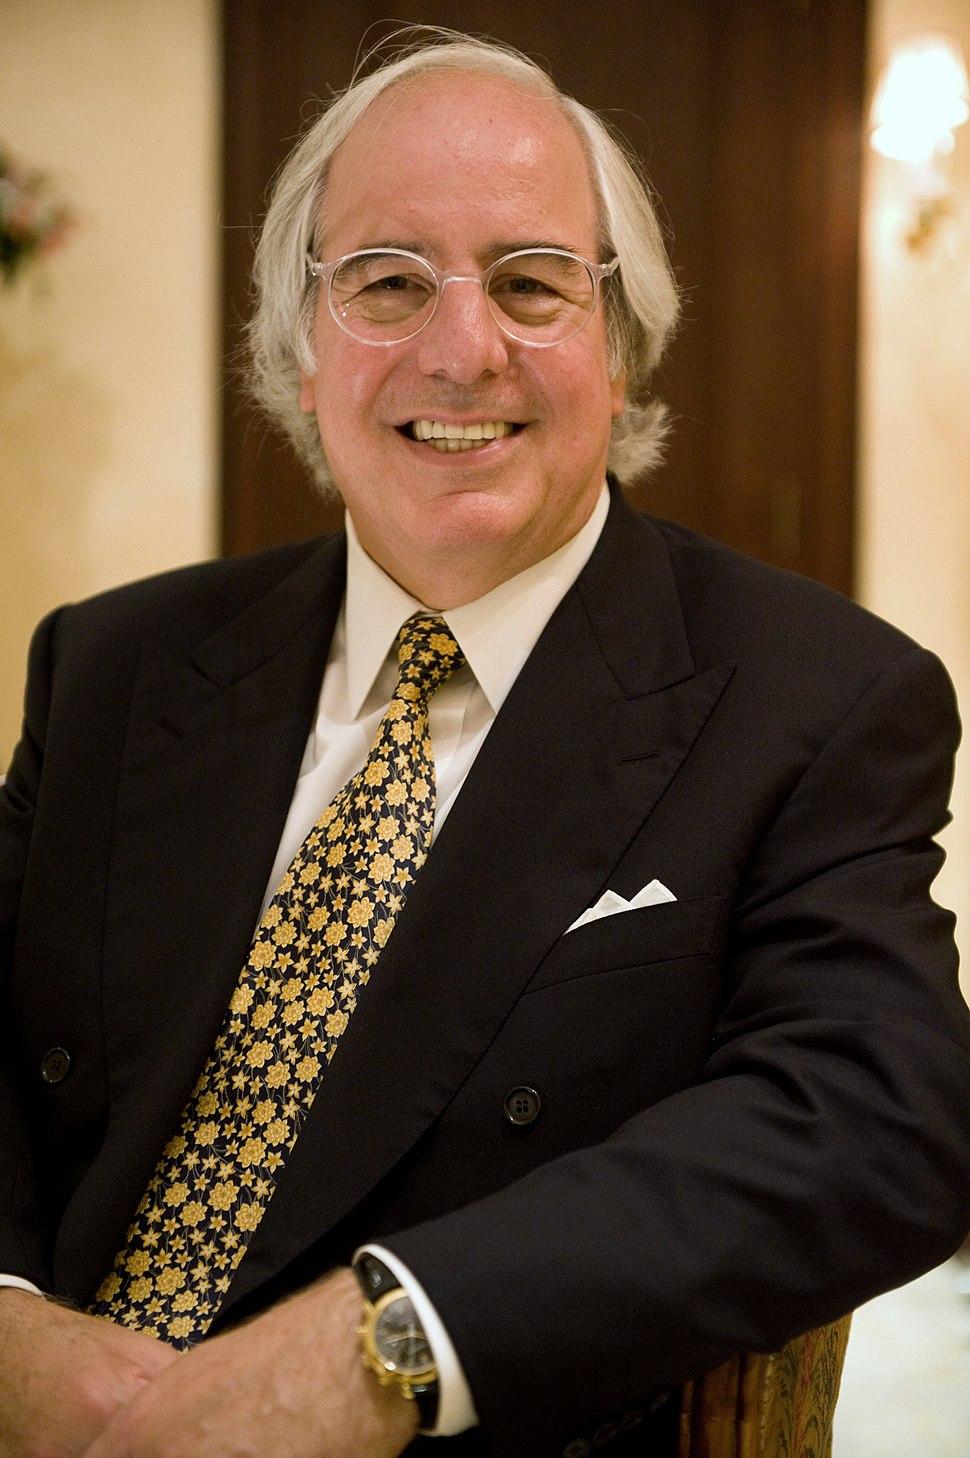 Frank W. Abagnale in 2008